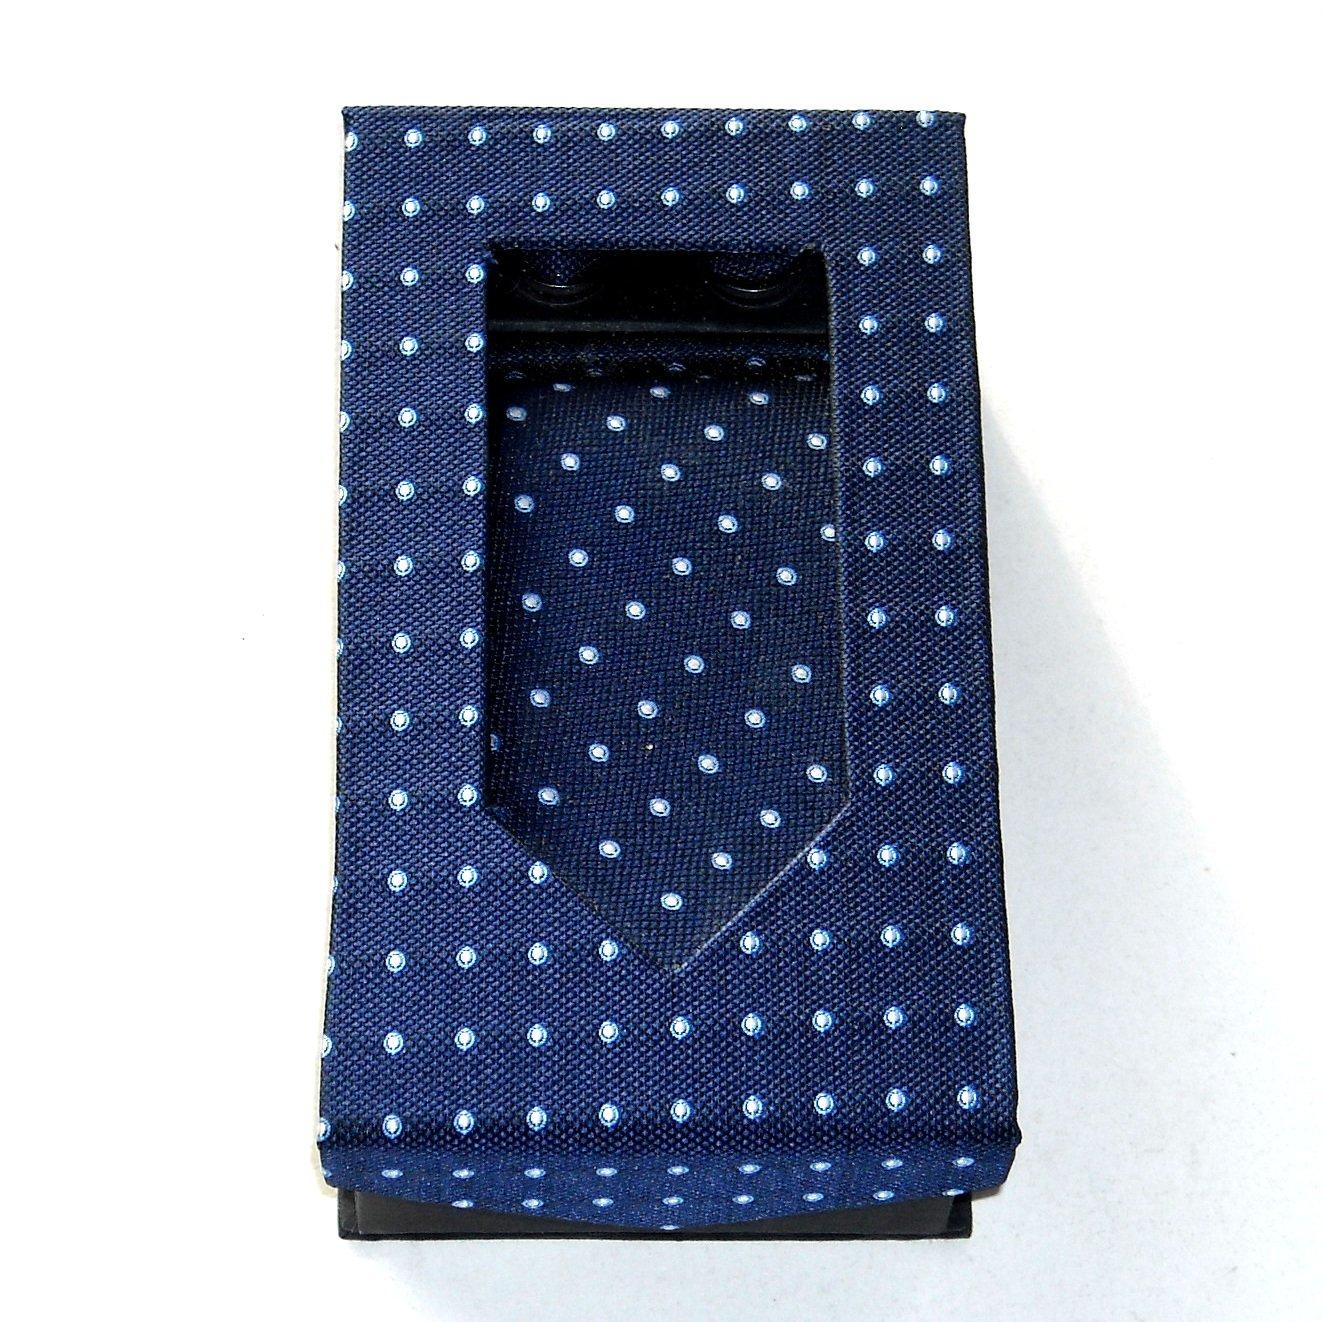 Blue White Dots Tie Handkerchief Cufflinks Boxed Gift Set